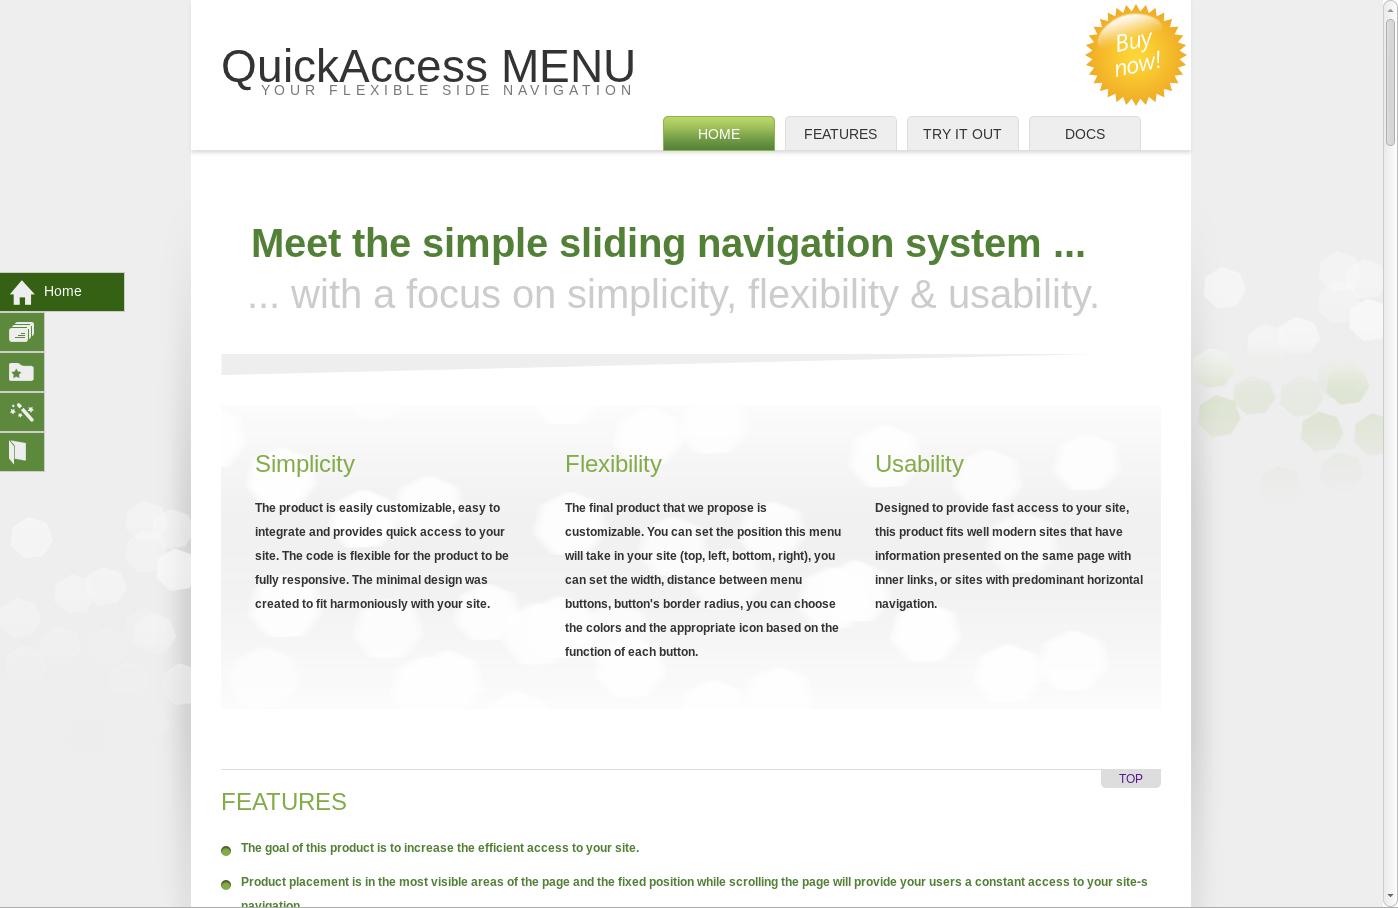 Quickaccess Menu Menu Minimal Design Simplicity